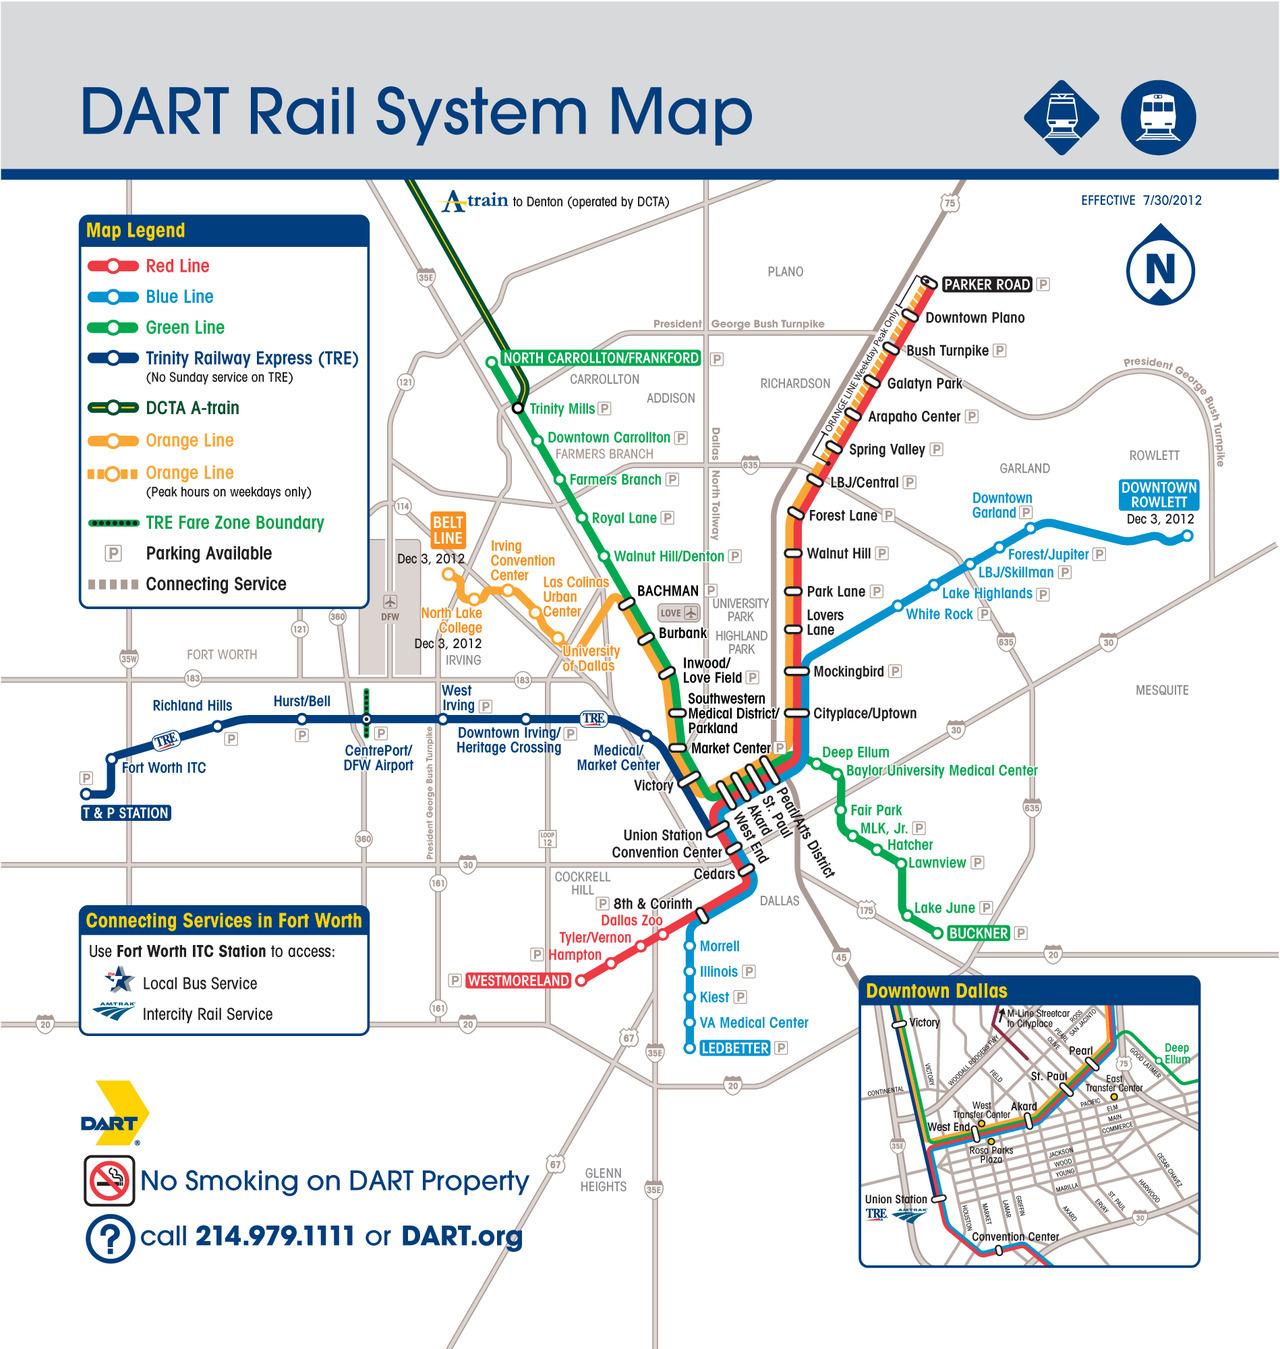 Transit Maps: